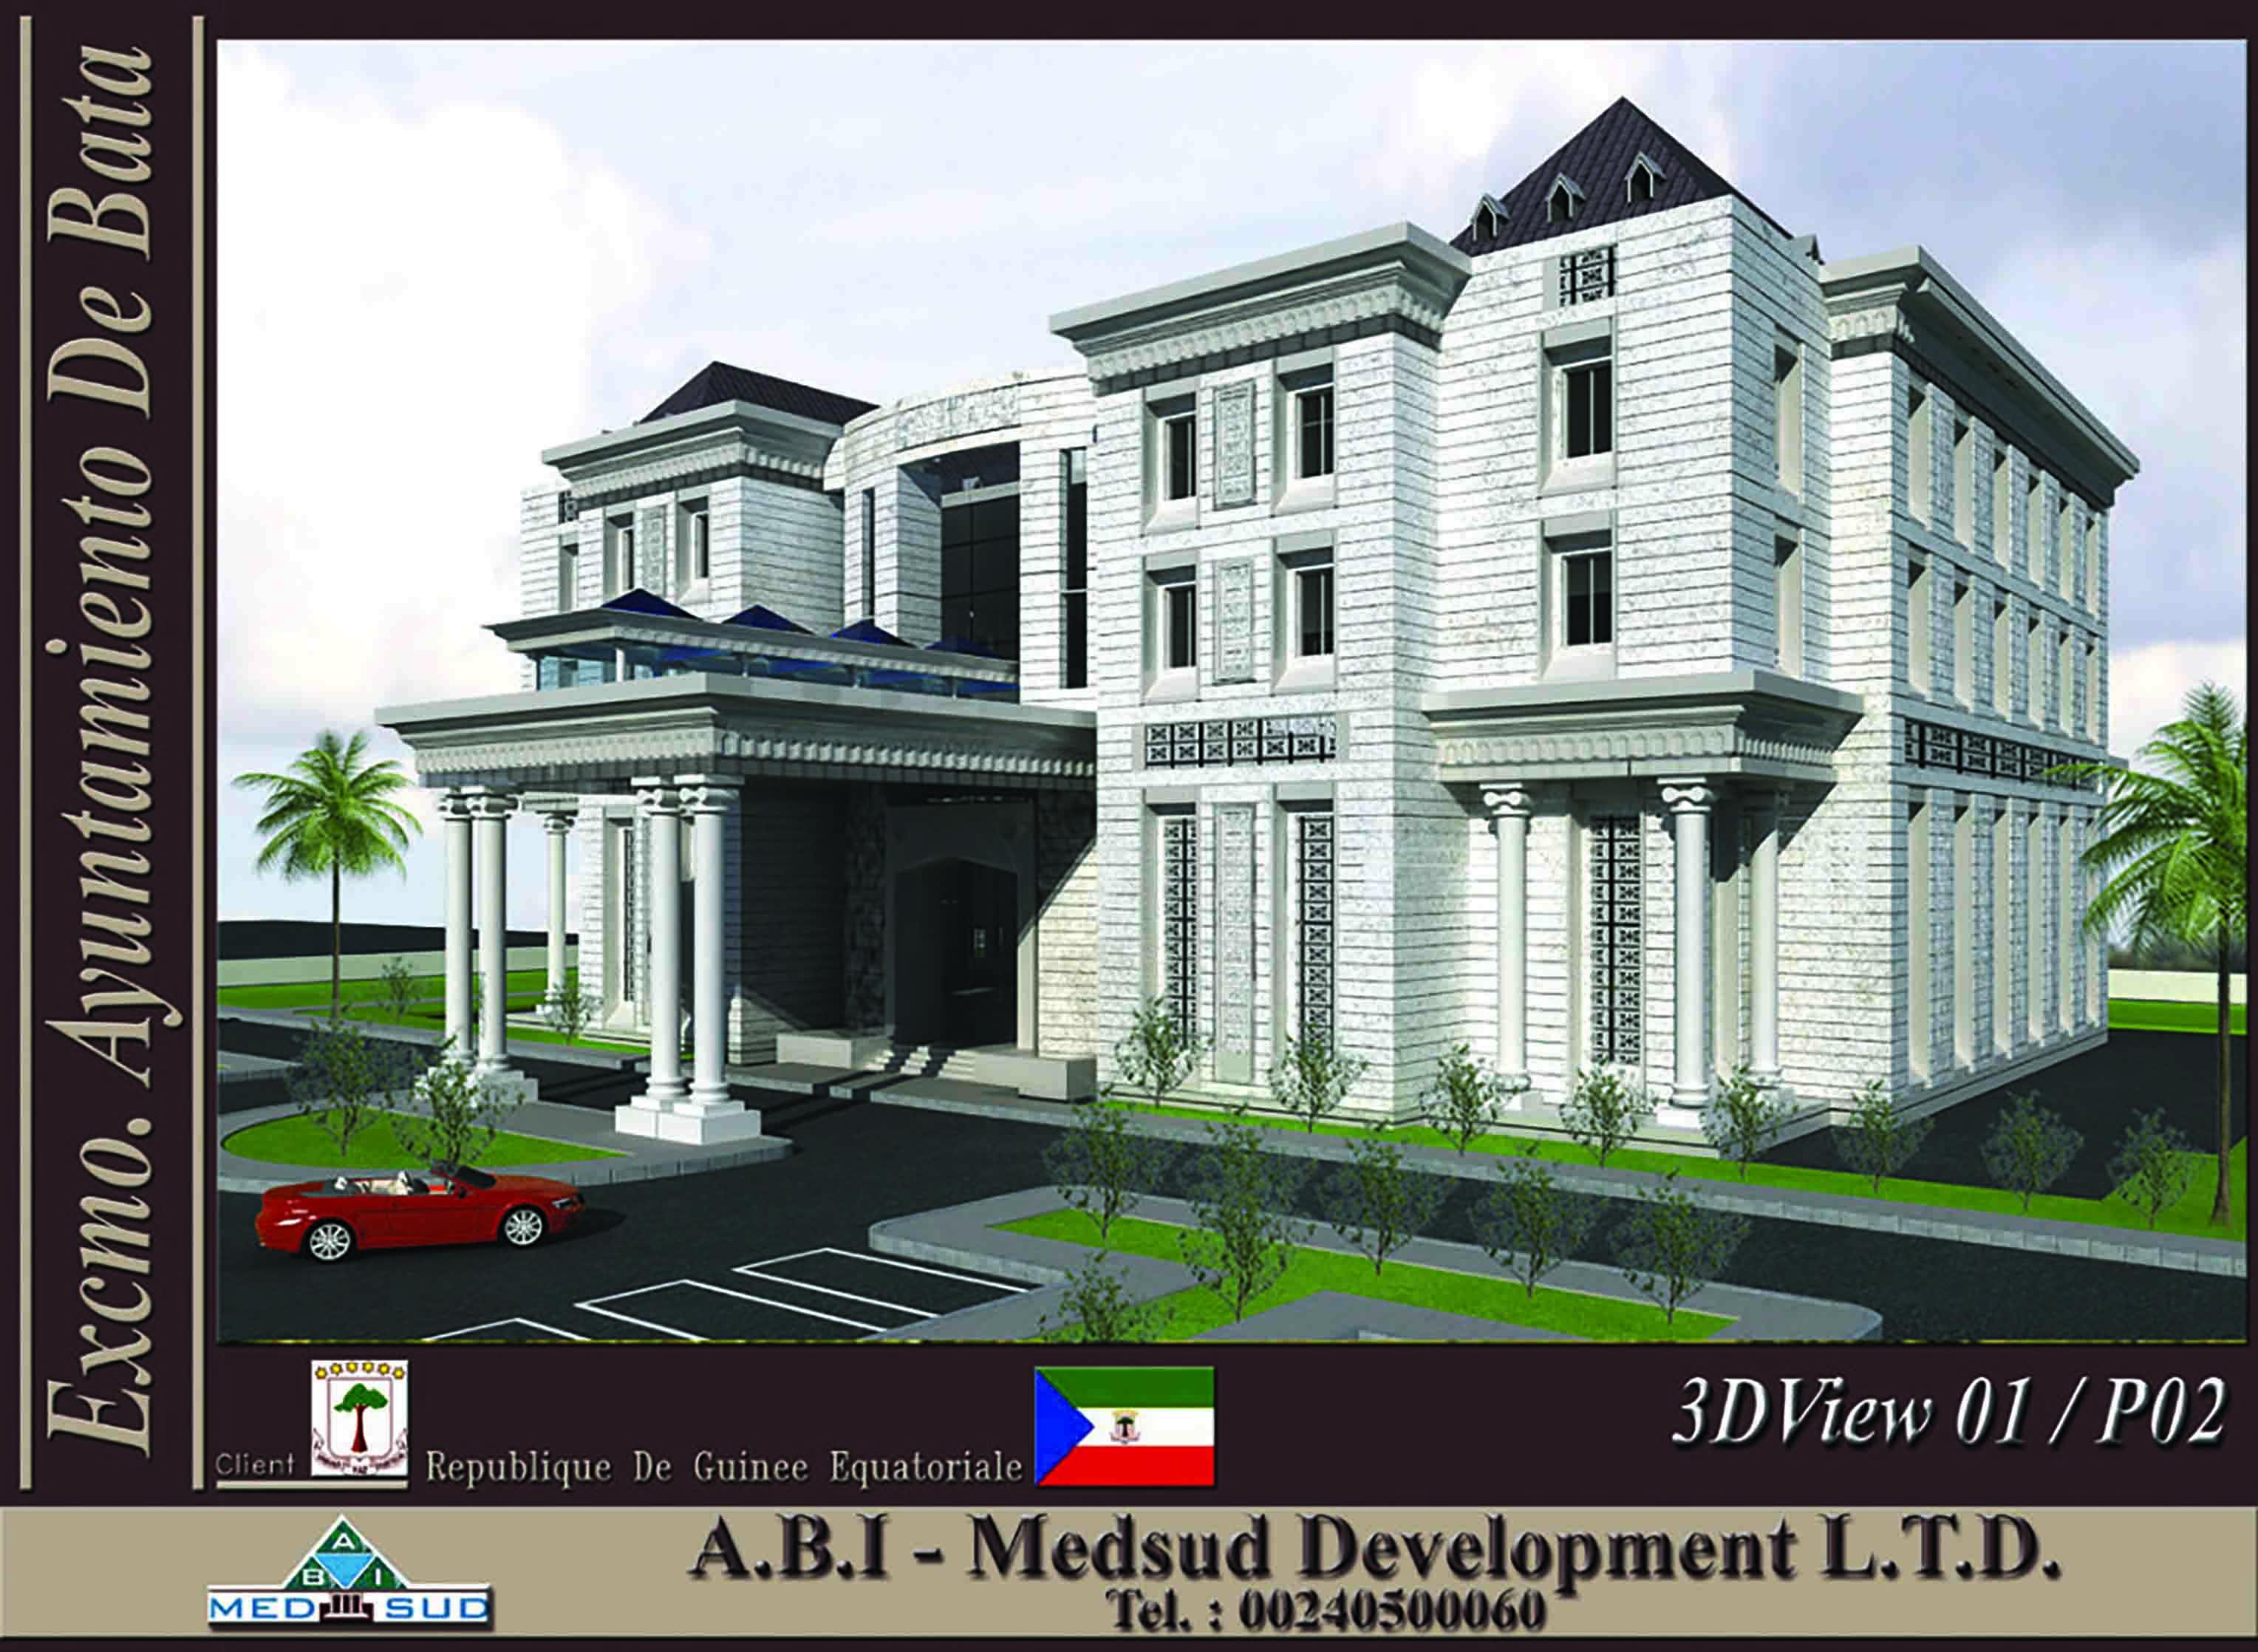 Fibrobeton Bata Municipality Building